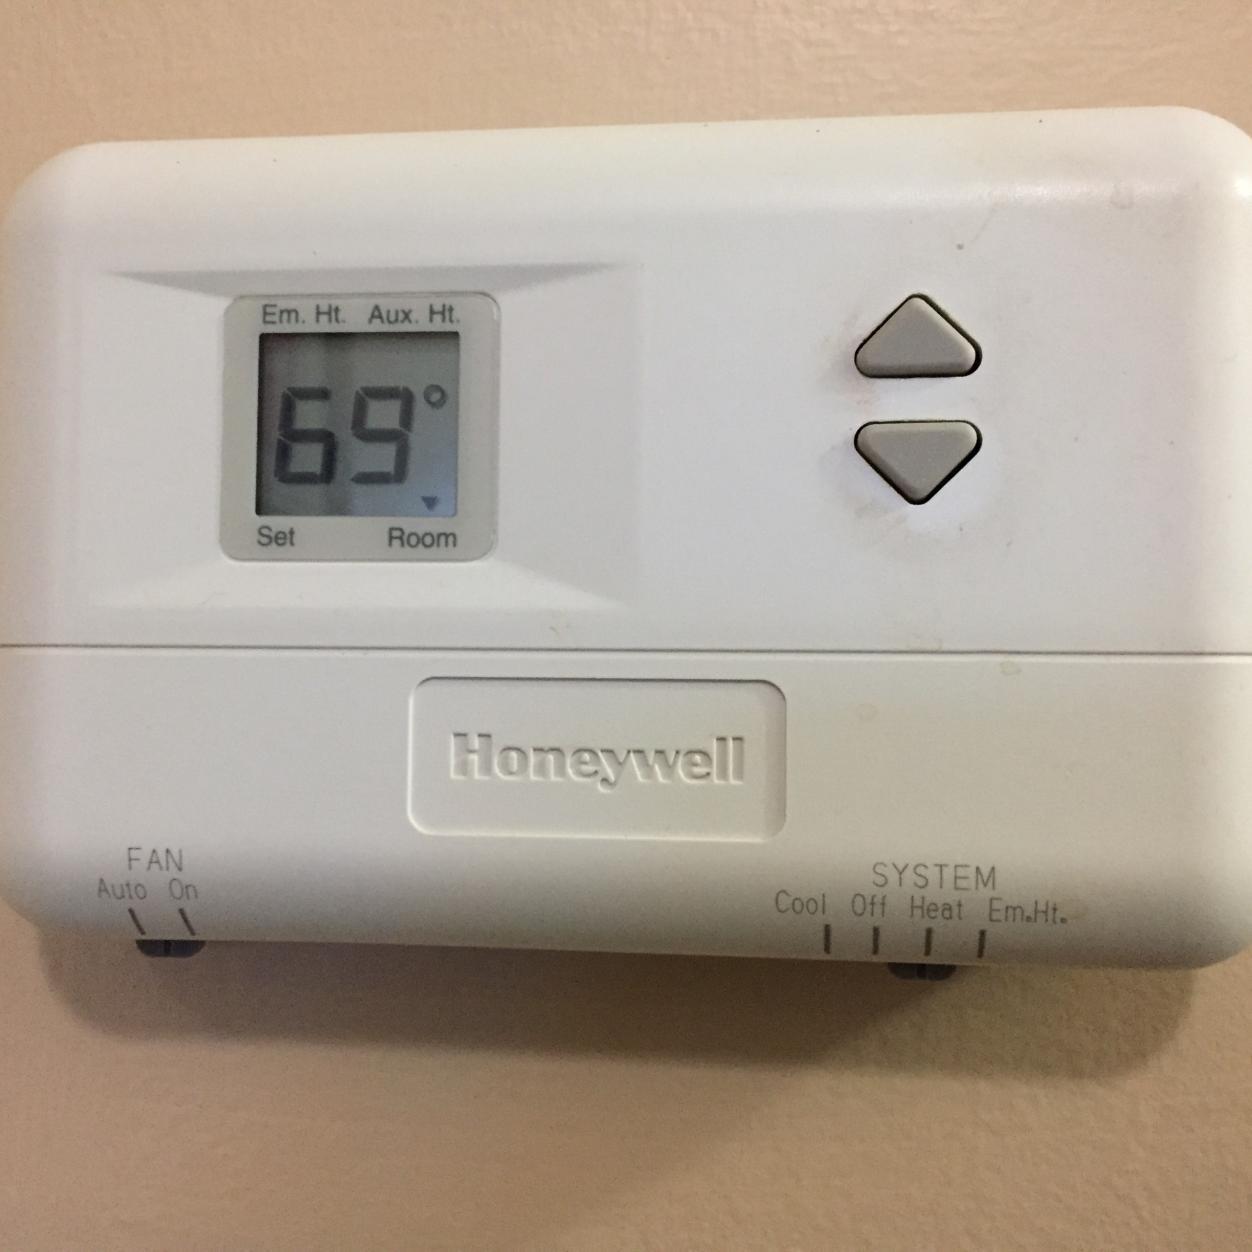 Need Help Hopefully Installing New Thermostat